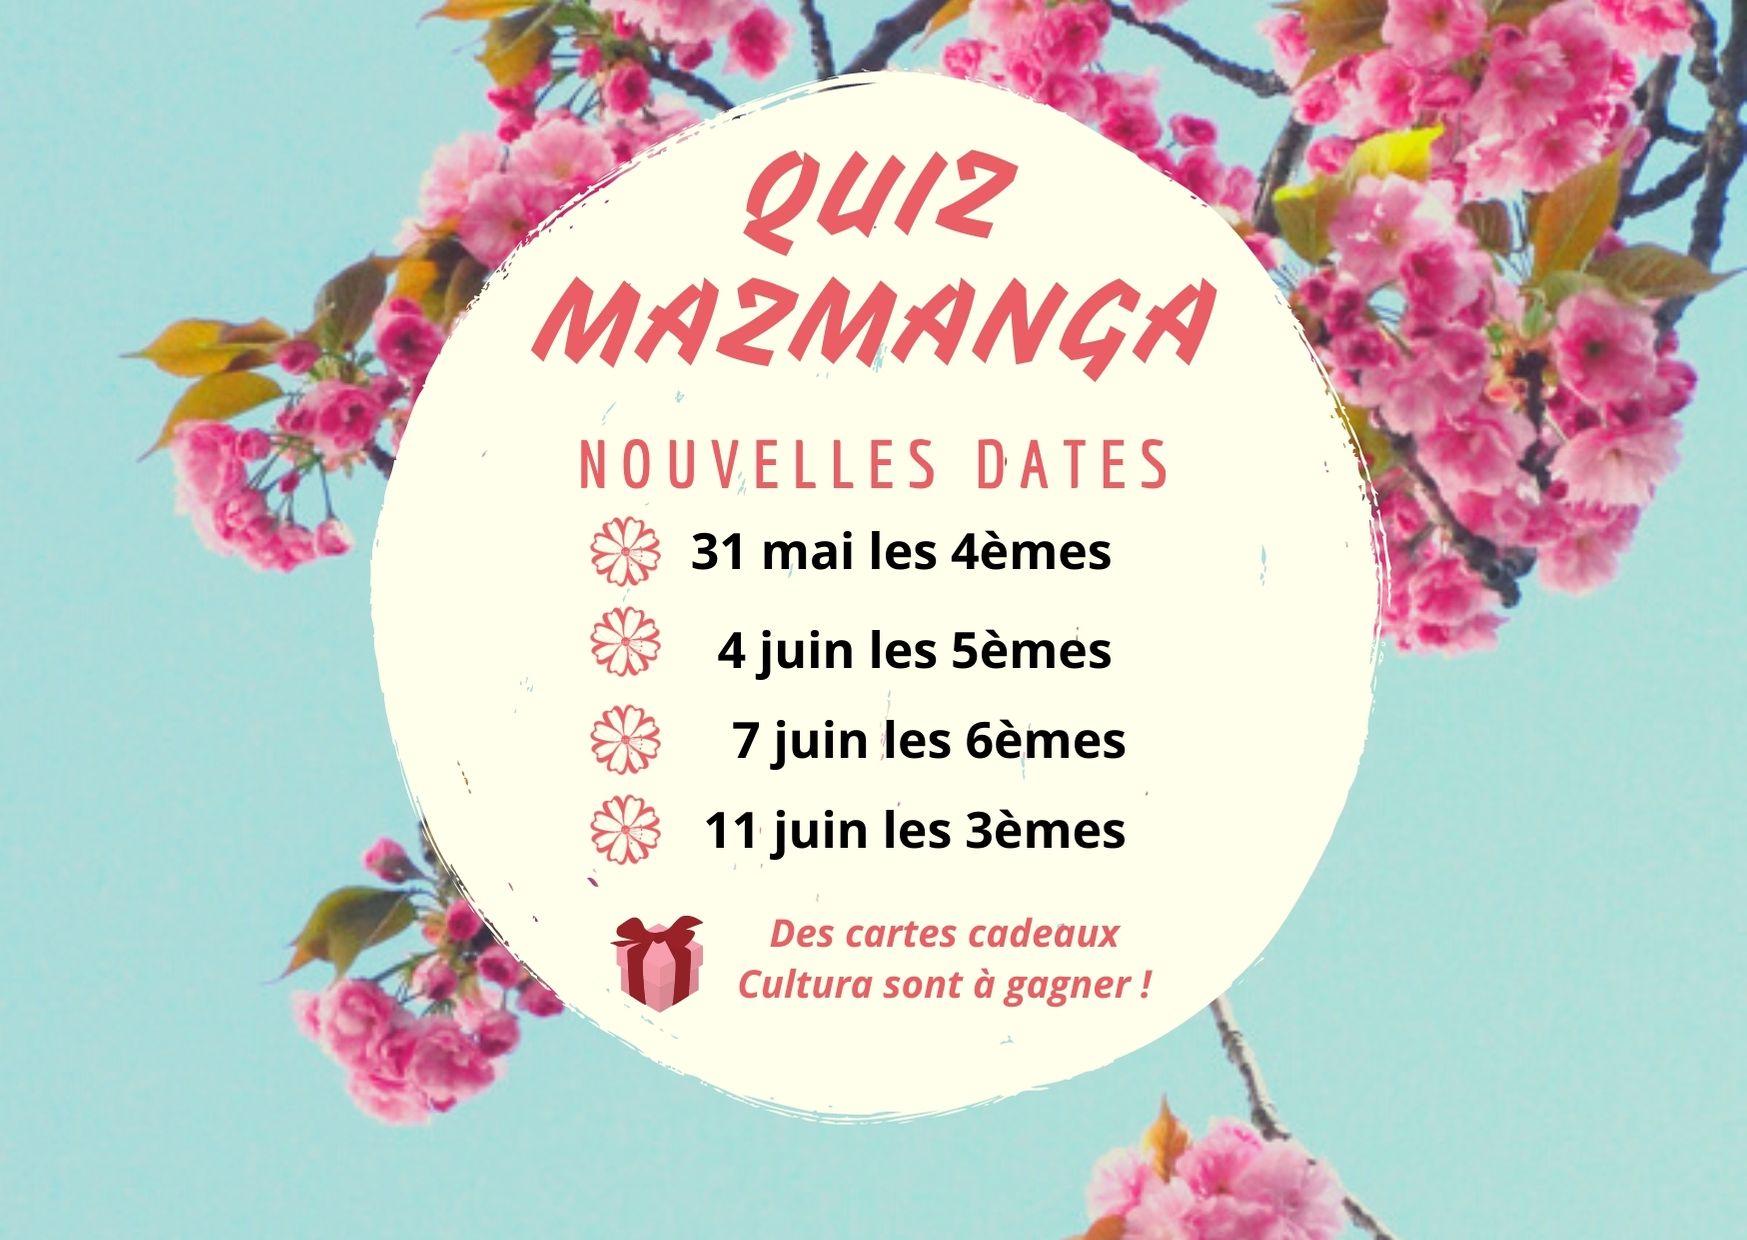 dates quiz mazmanga